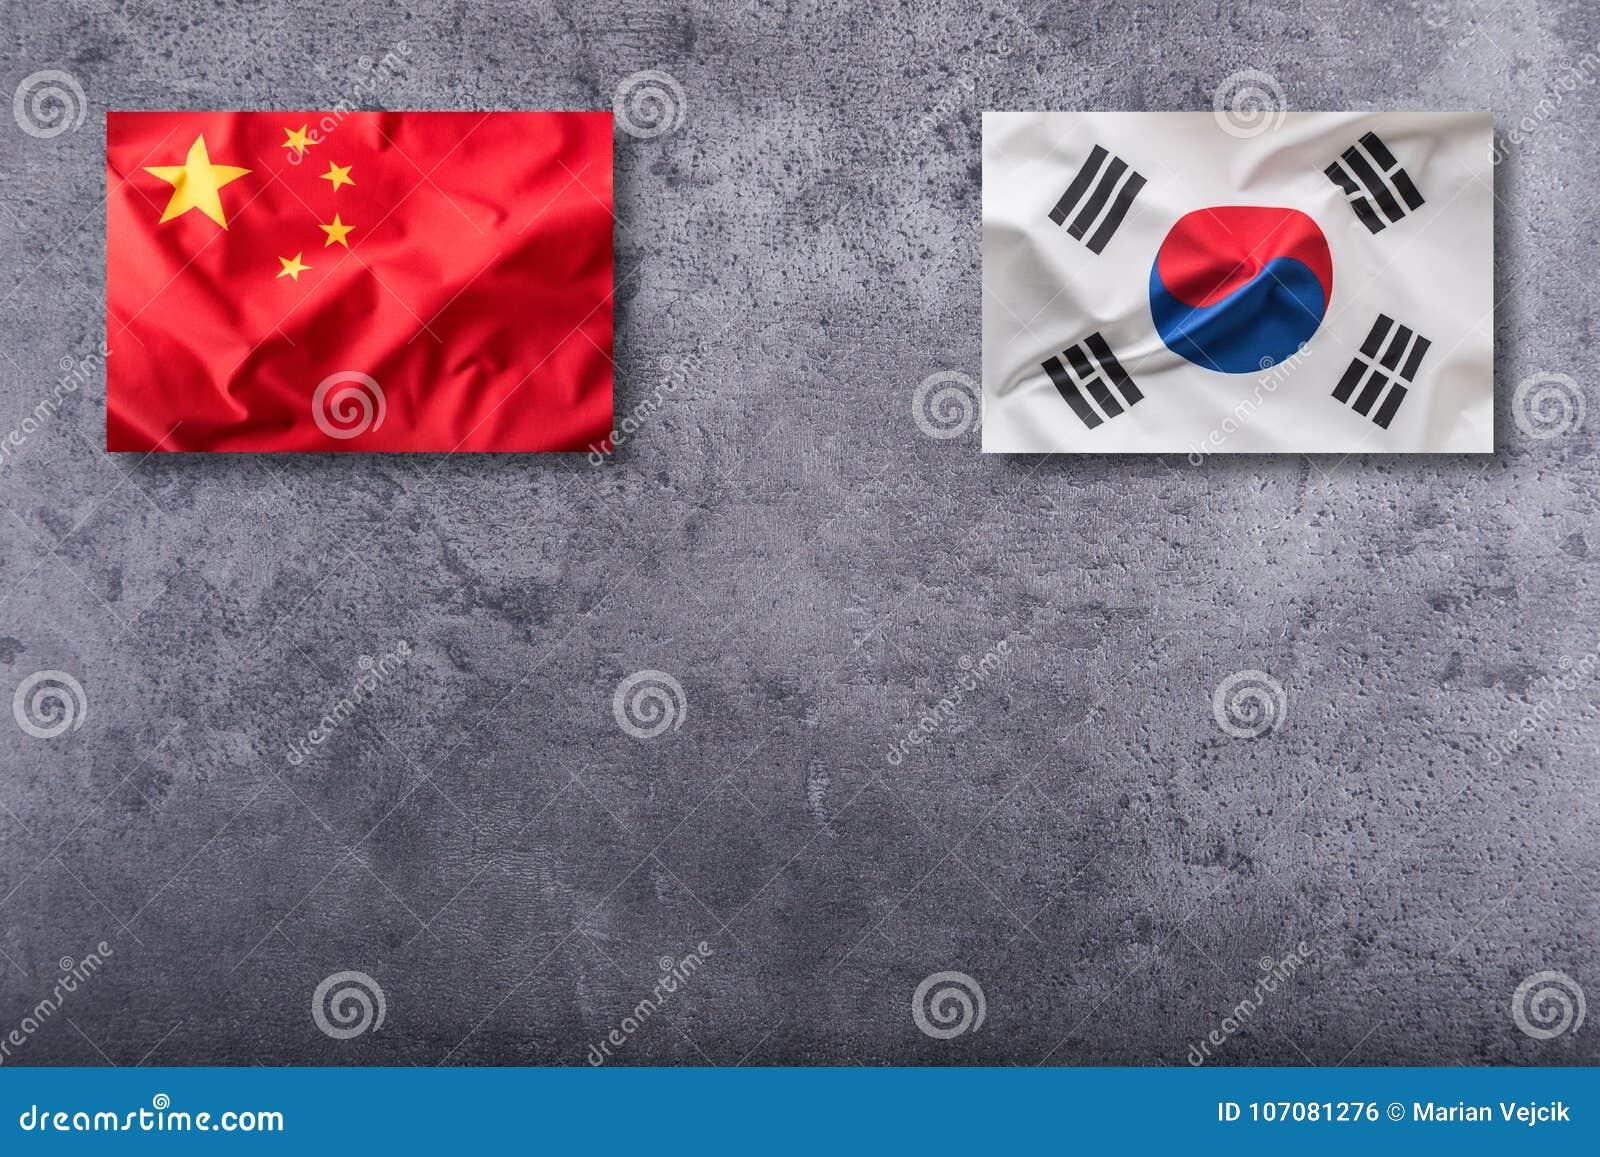 China and South korea flag on concrete background